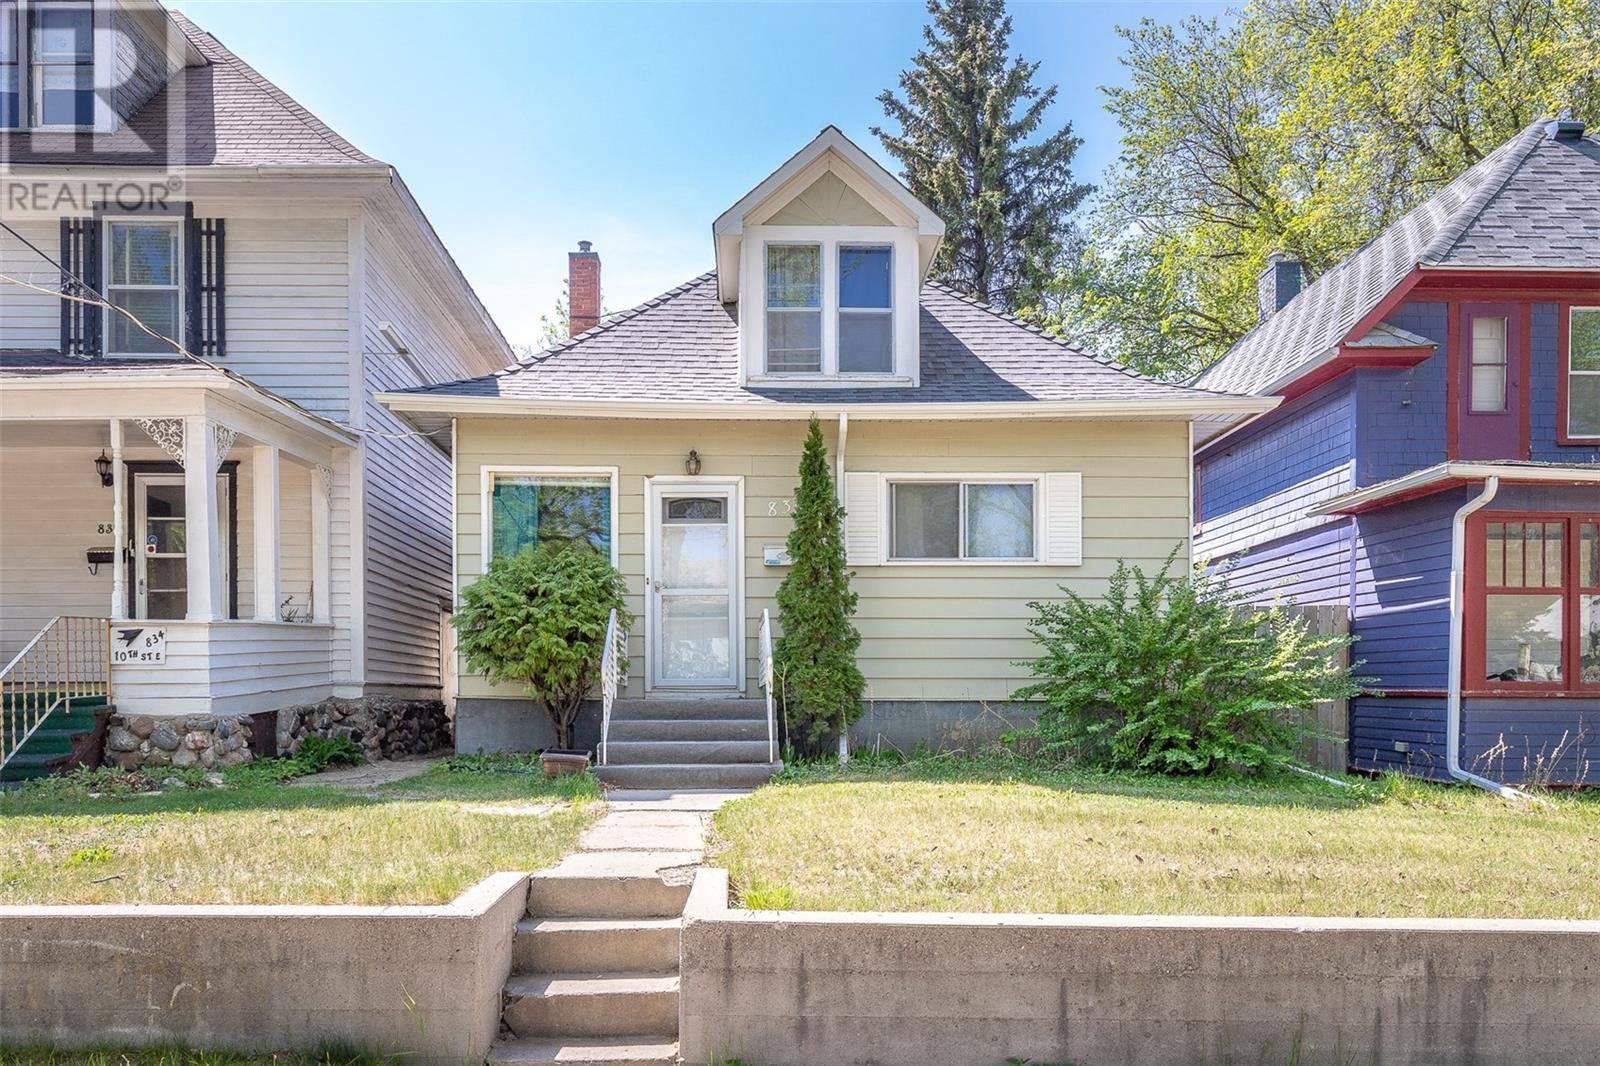 House for sale at 830 10th St E Saskatoon Saskatchewan - MLS: SK793009